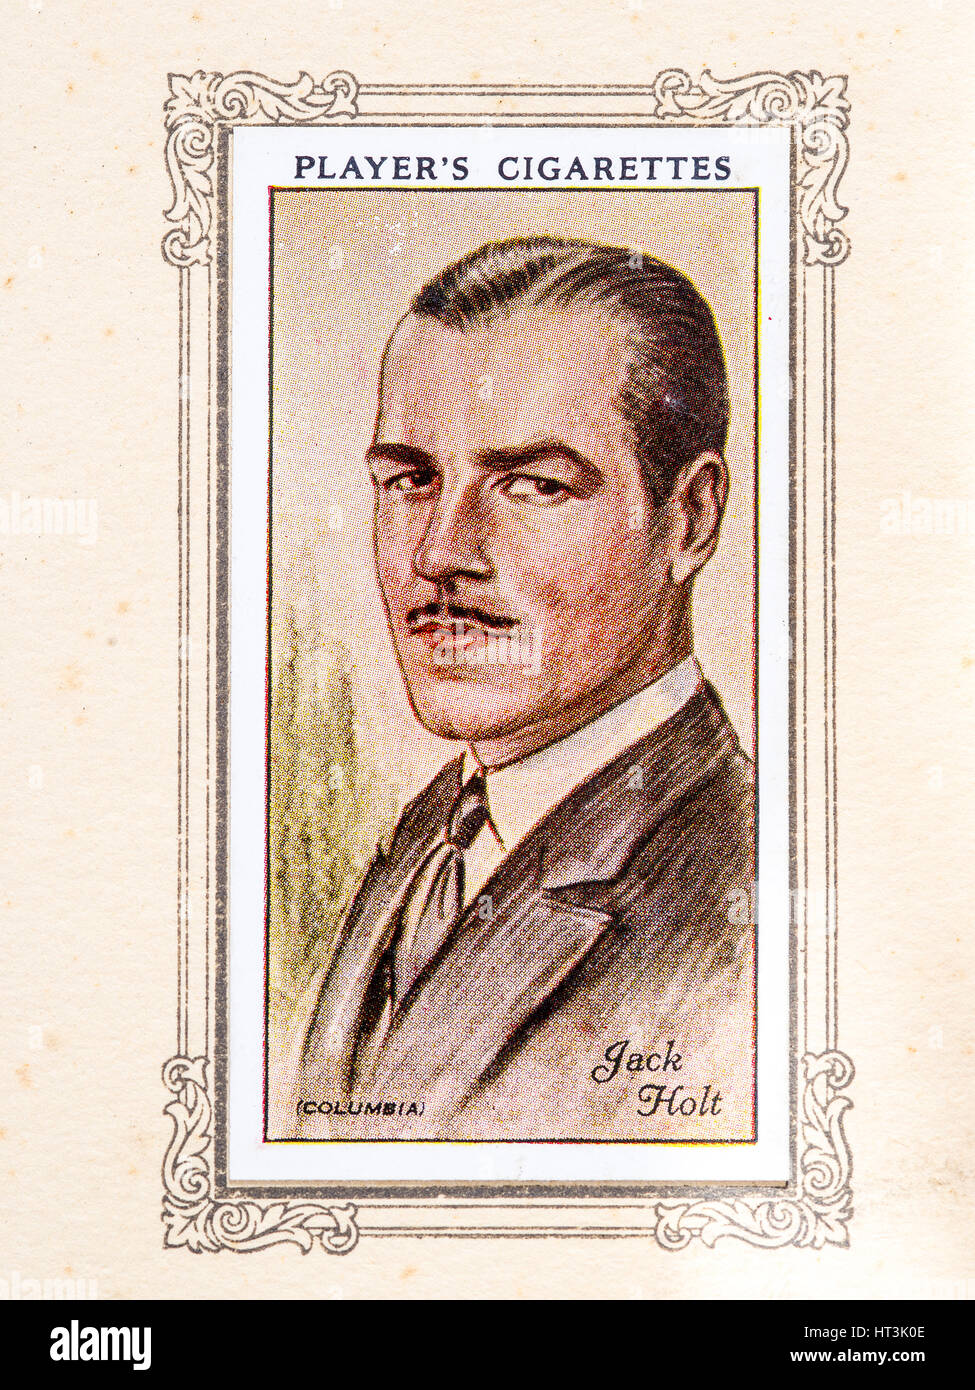 Jack Holt, 1934. Charles John Jack Holt Jr. (31. Mai 1888 - 18. Januar 1951) war ein amerikanischer Film Schauspieler Stockbild